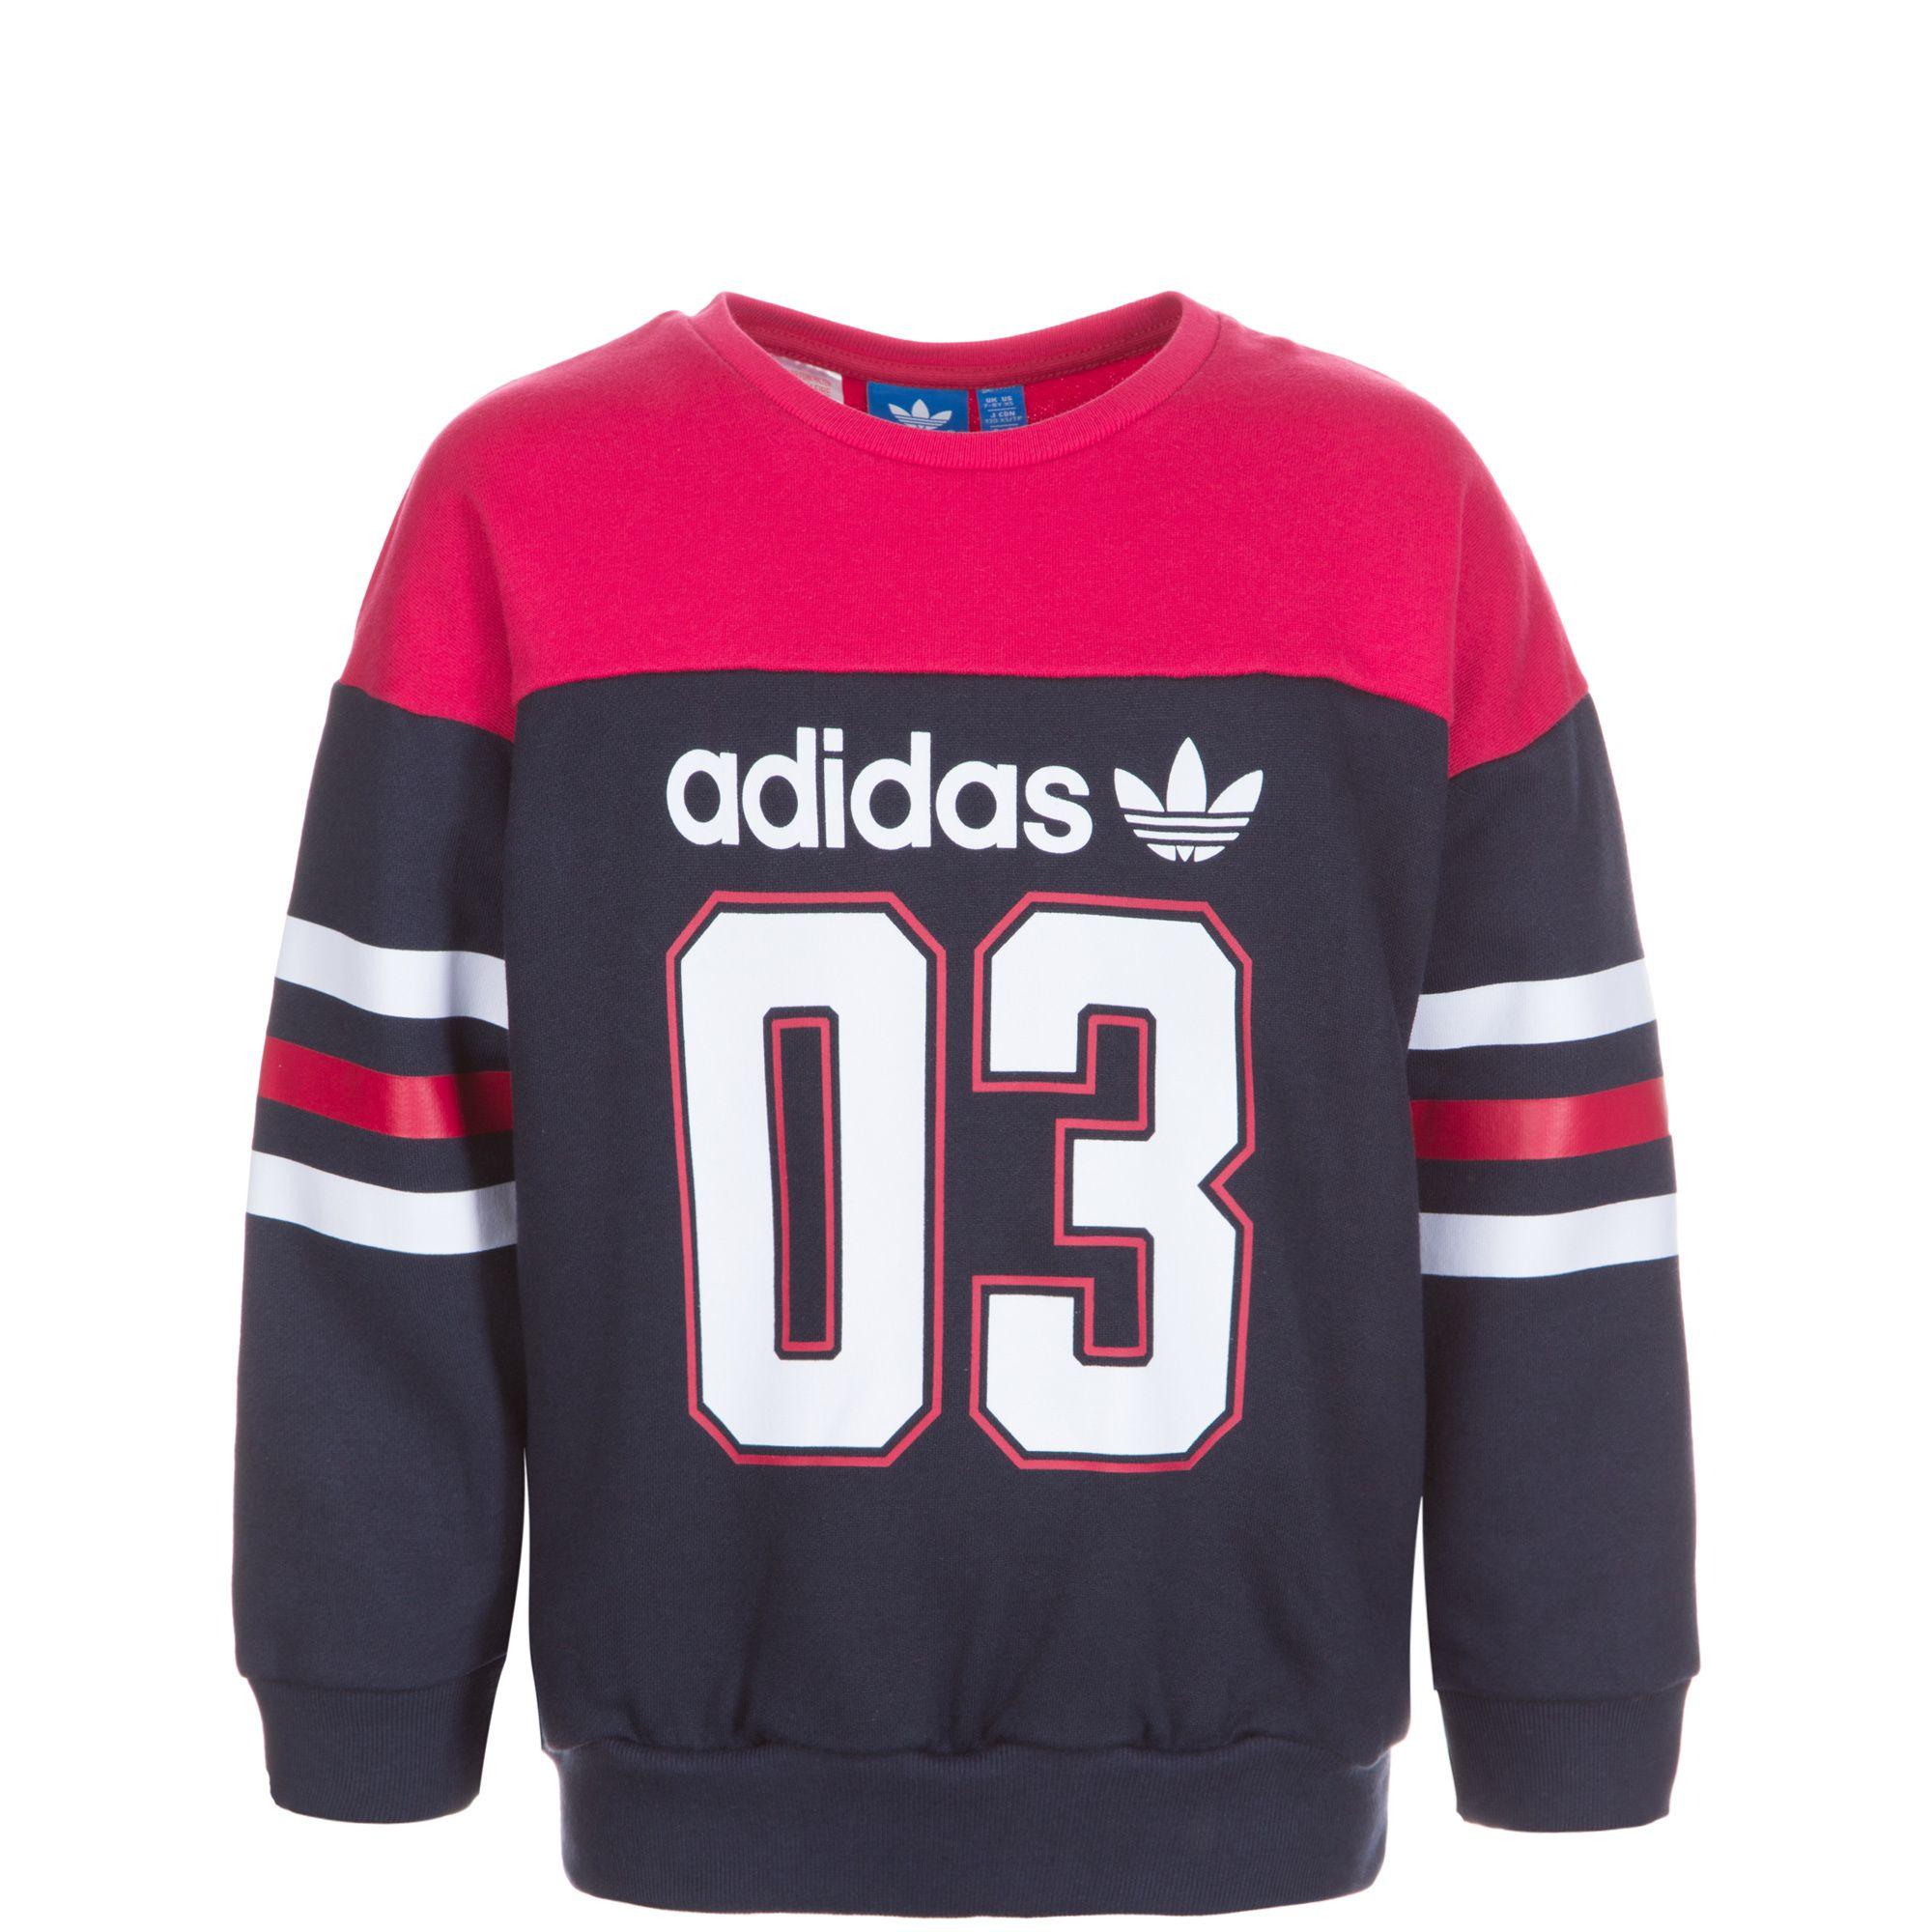 ADIDAS ORIGINALS adidas Originals FR Crew Sweatshirt Kinder